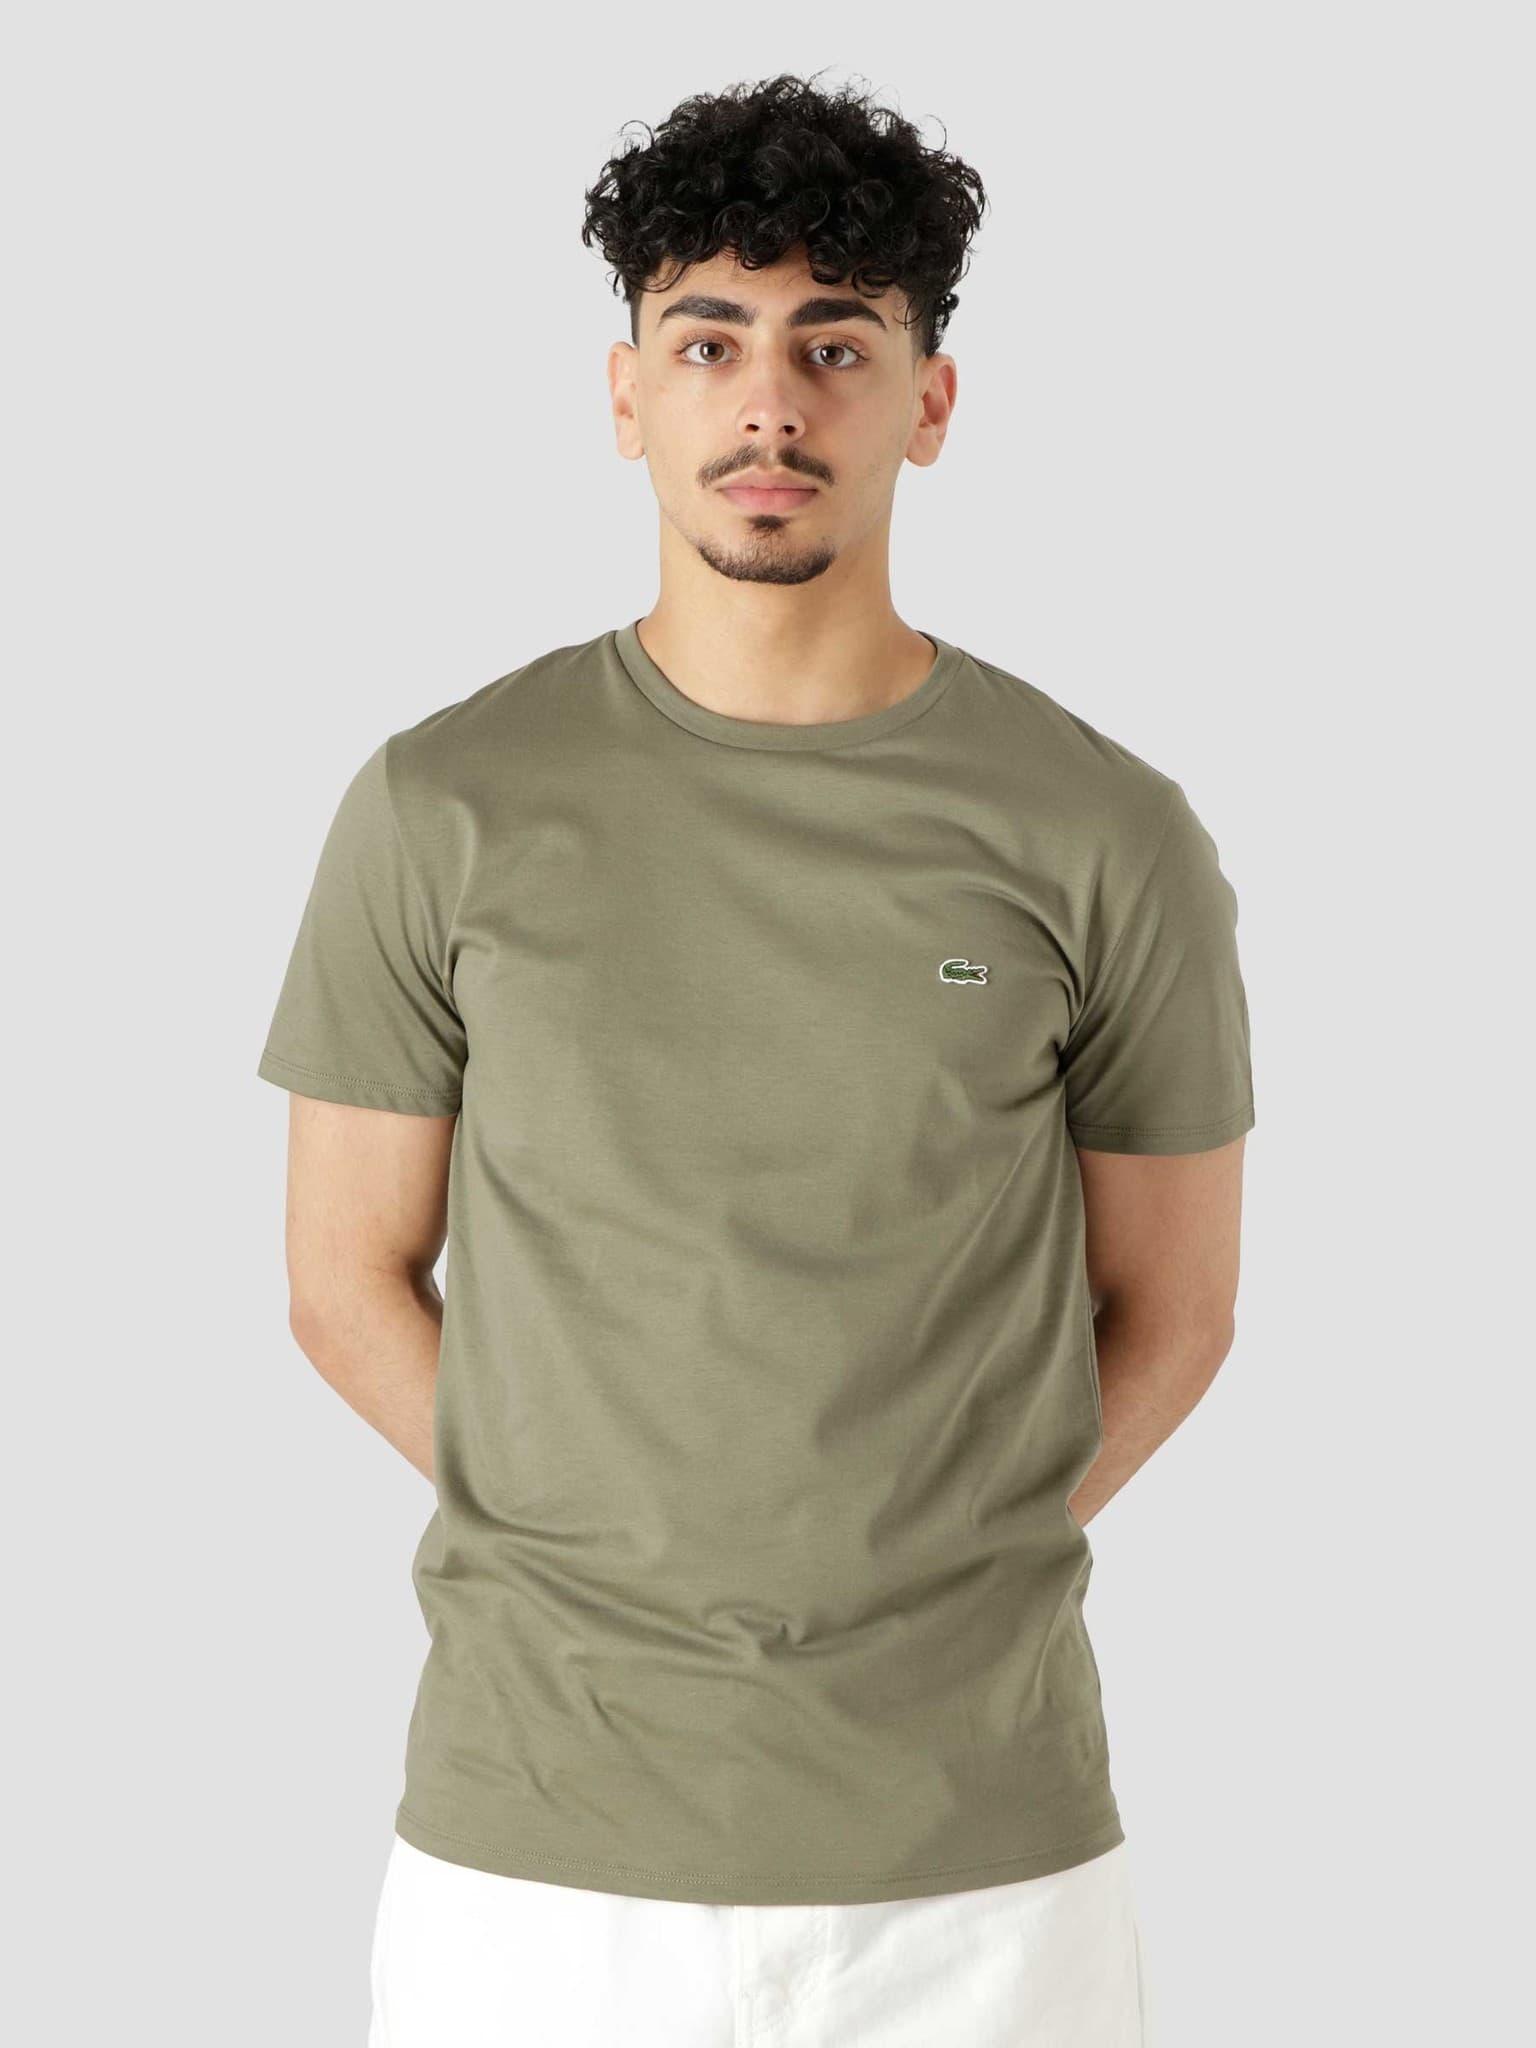 1HT1 Men's T-Shirt Tank TH6709-11